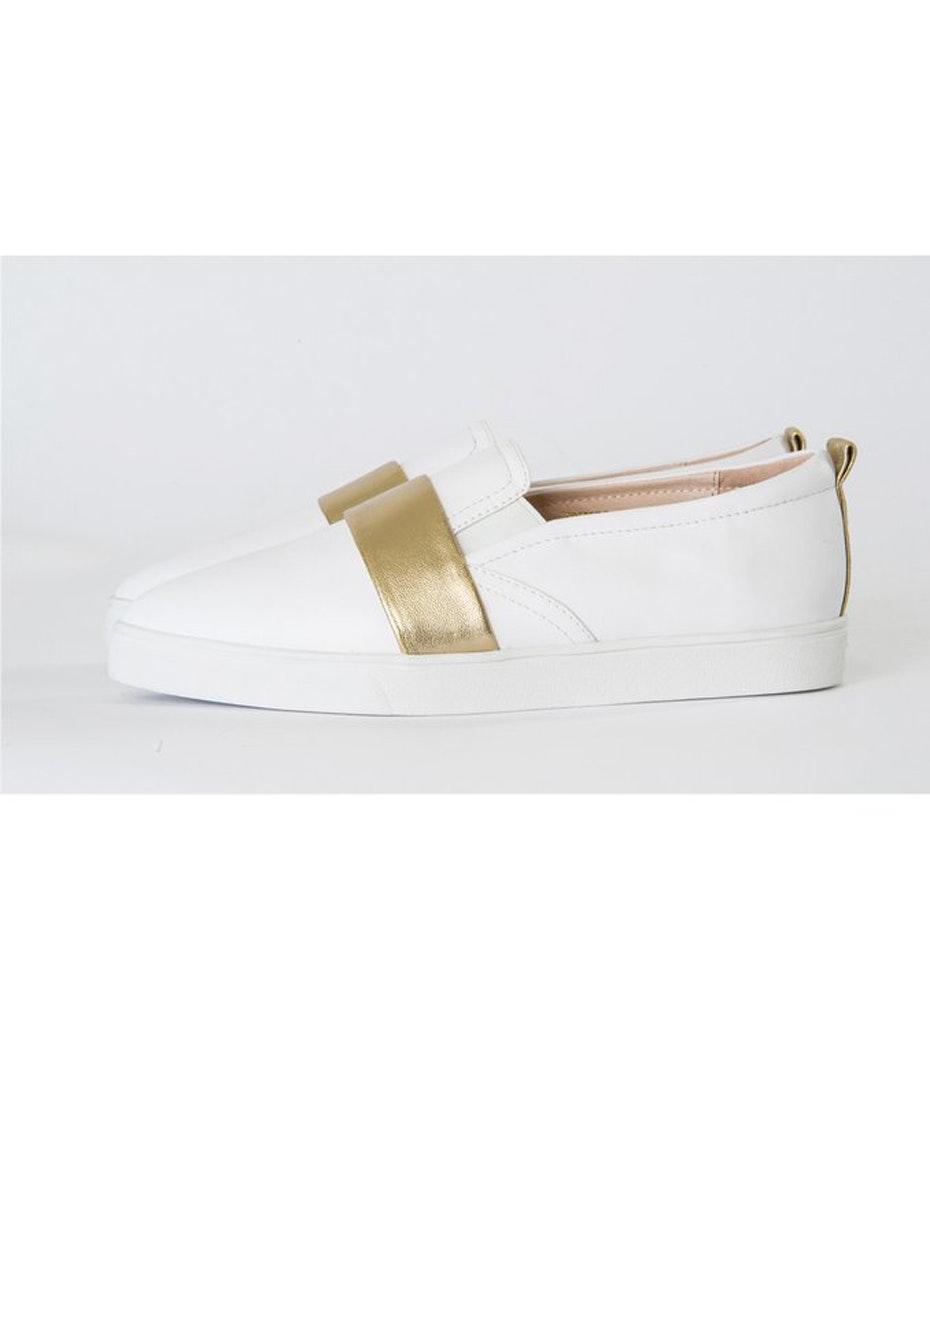 Julian Danger - Stella Sneaker - White & gold